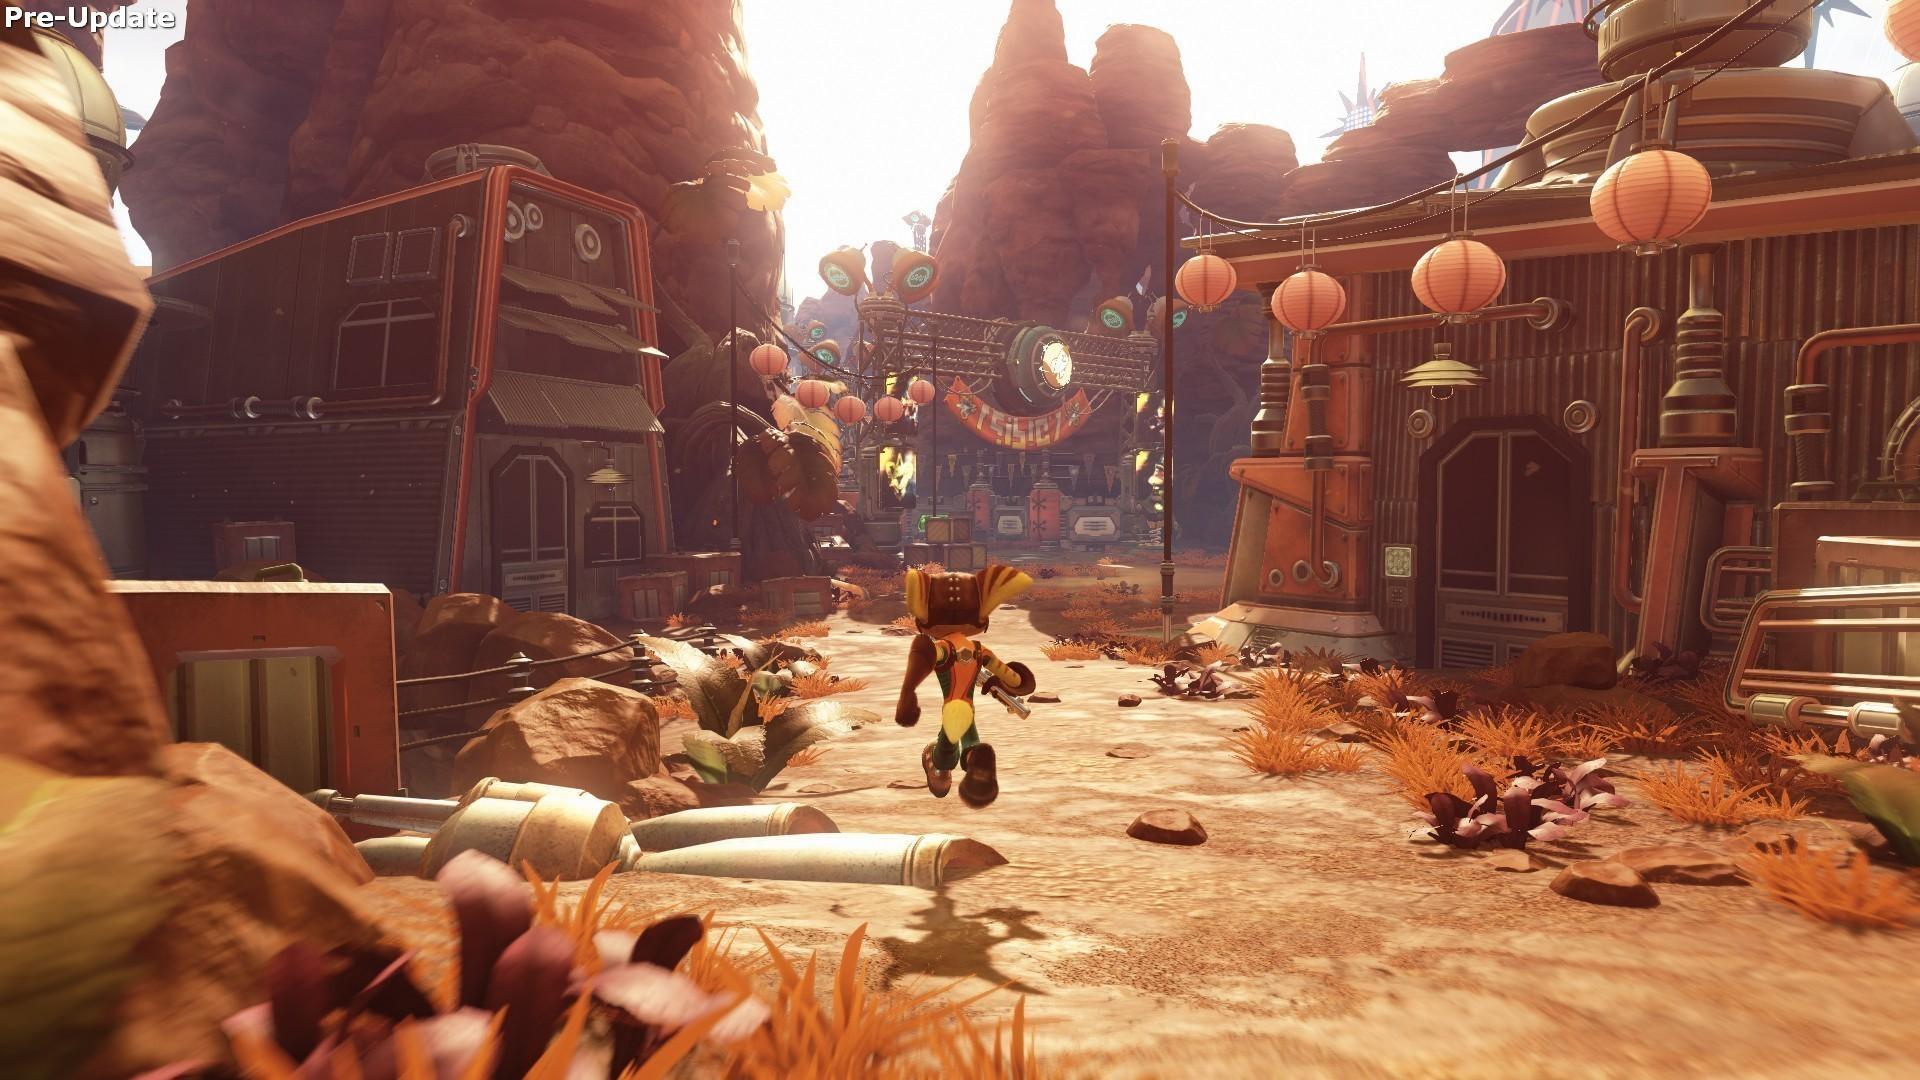 The Best PS4 Platformer Games PS4 Home